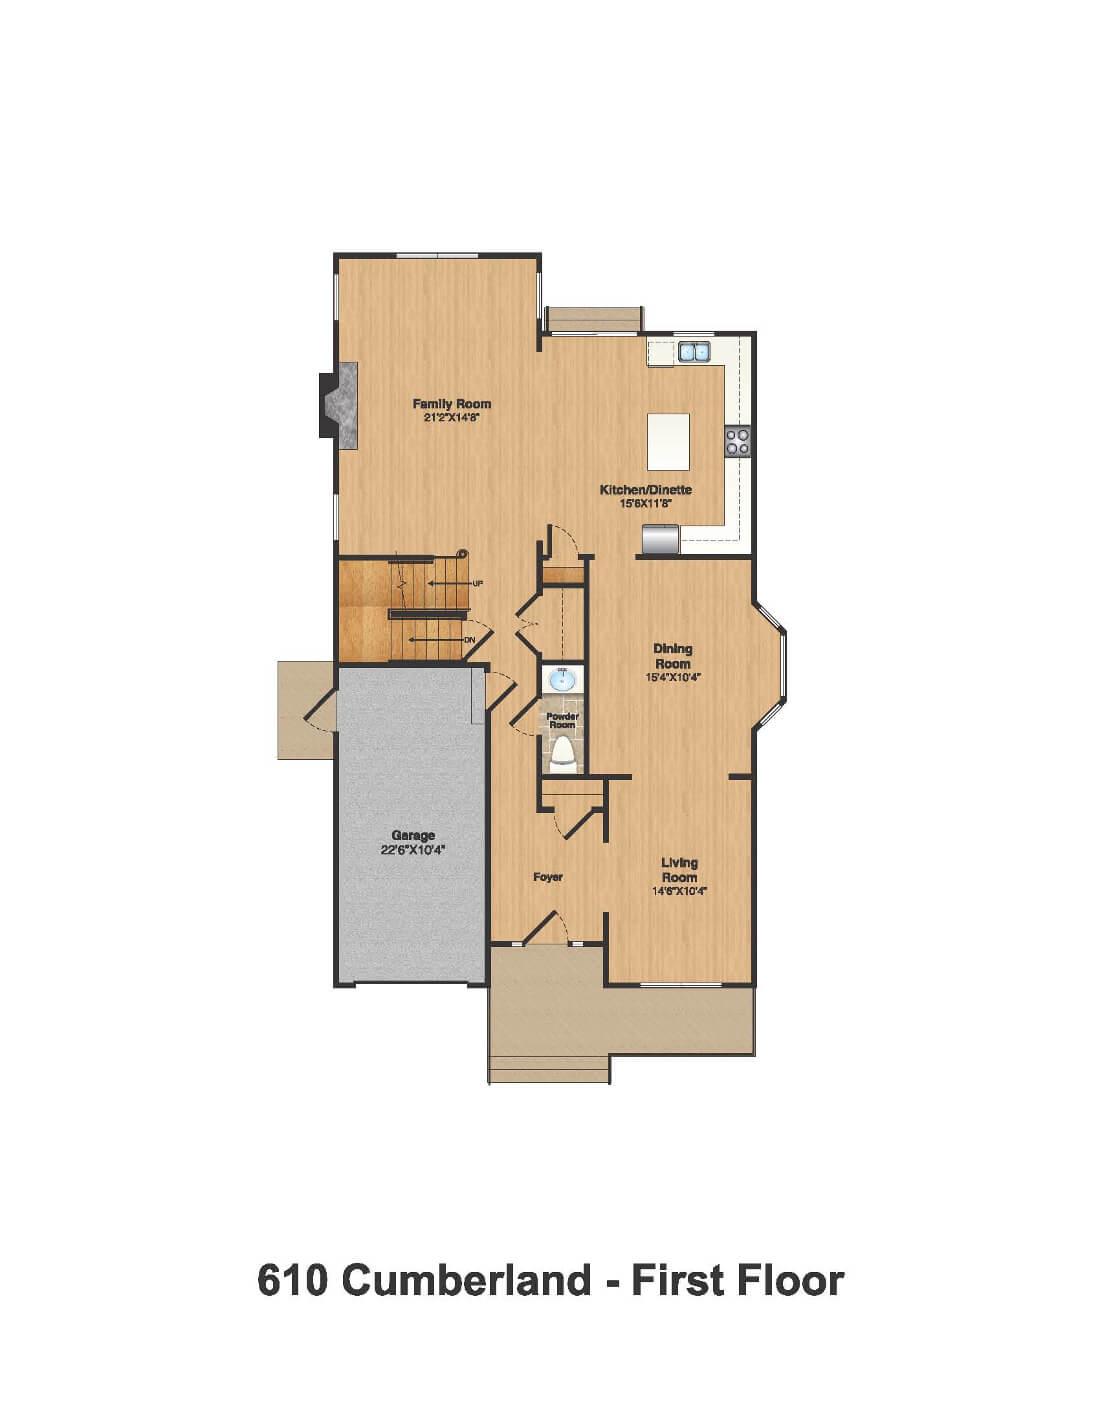 610 Cumberland Floorplan 1st Floor Color